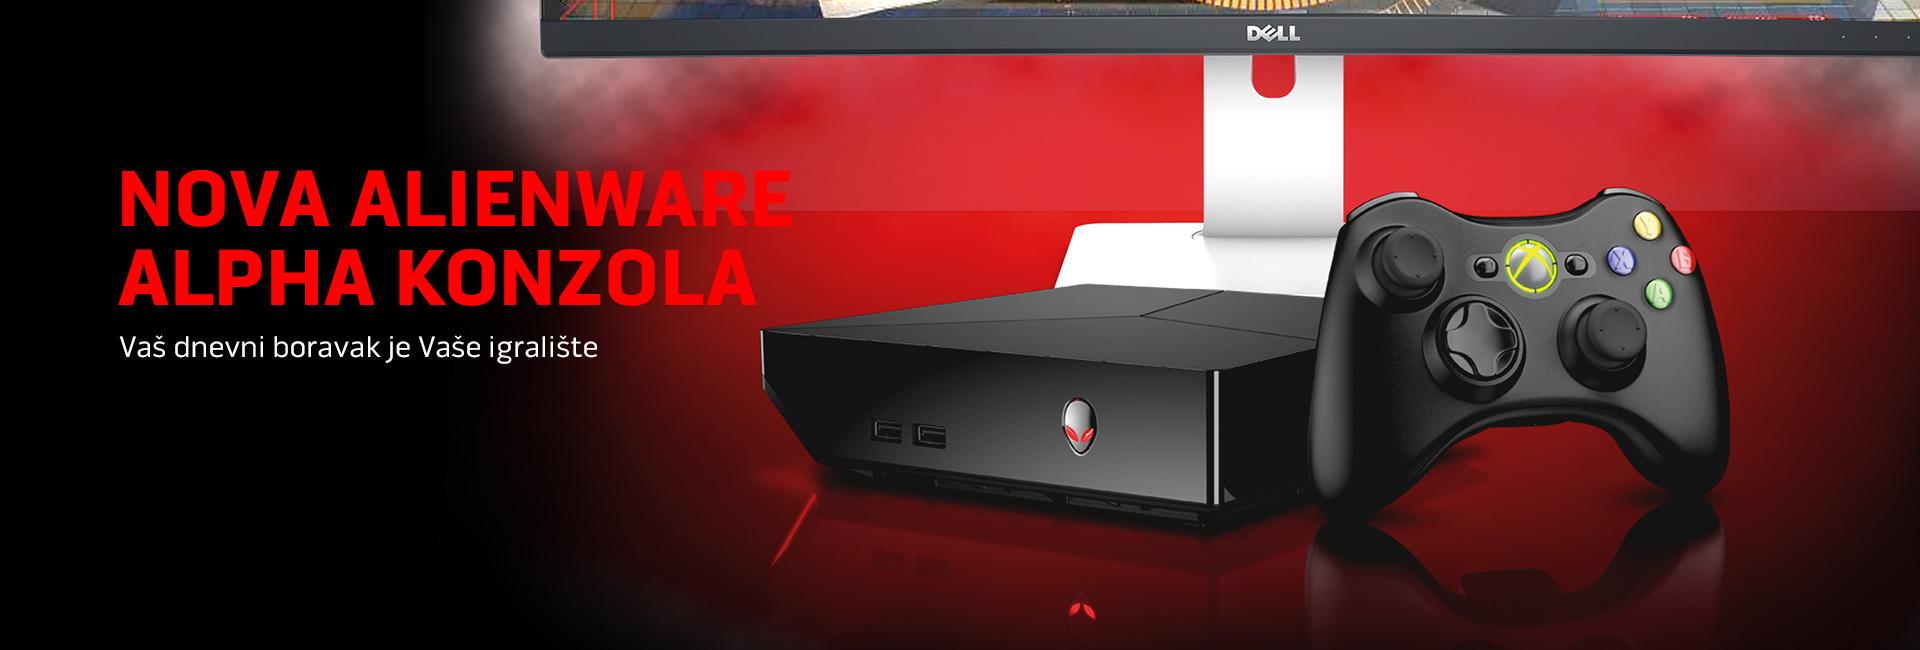 Nova Alienware alpha konzola